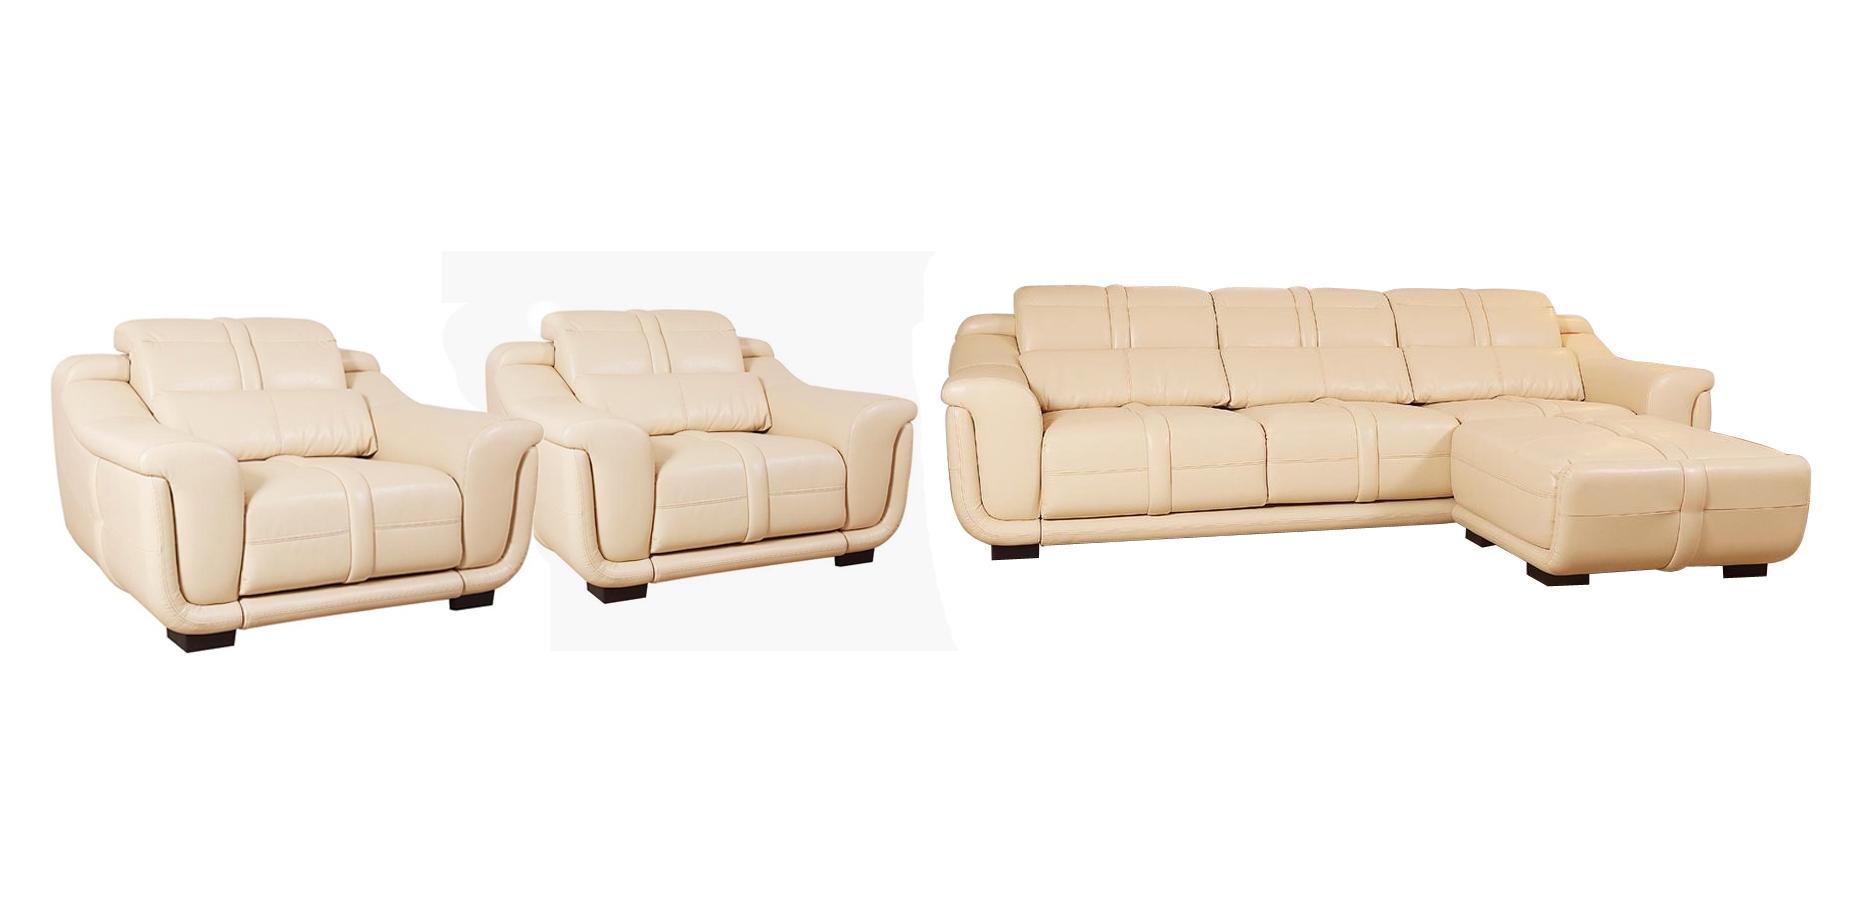 Комплект мягкой мебели Мартин